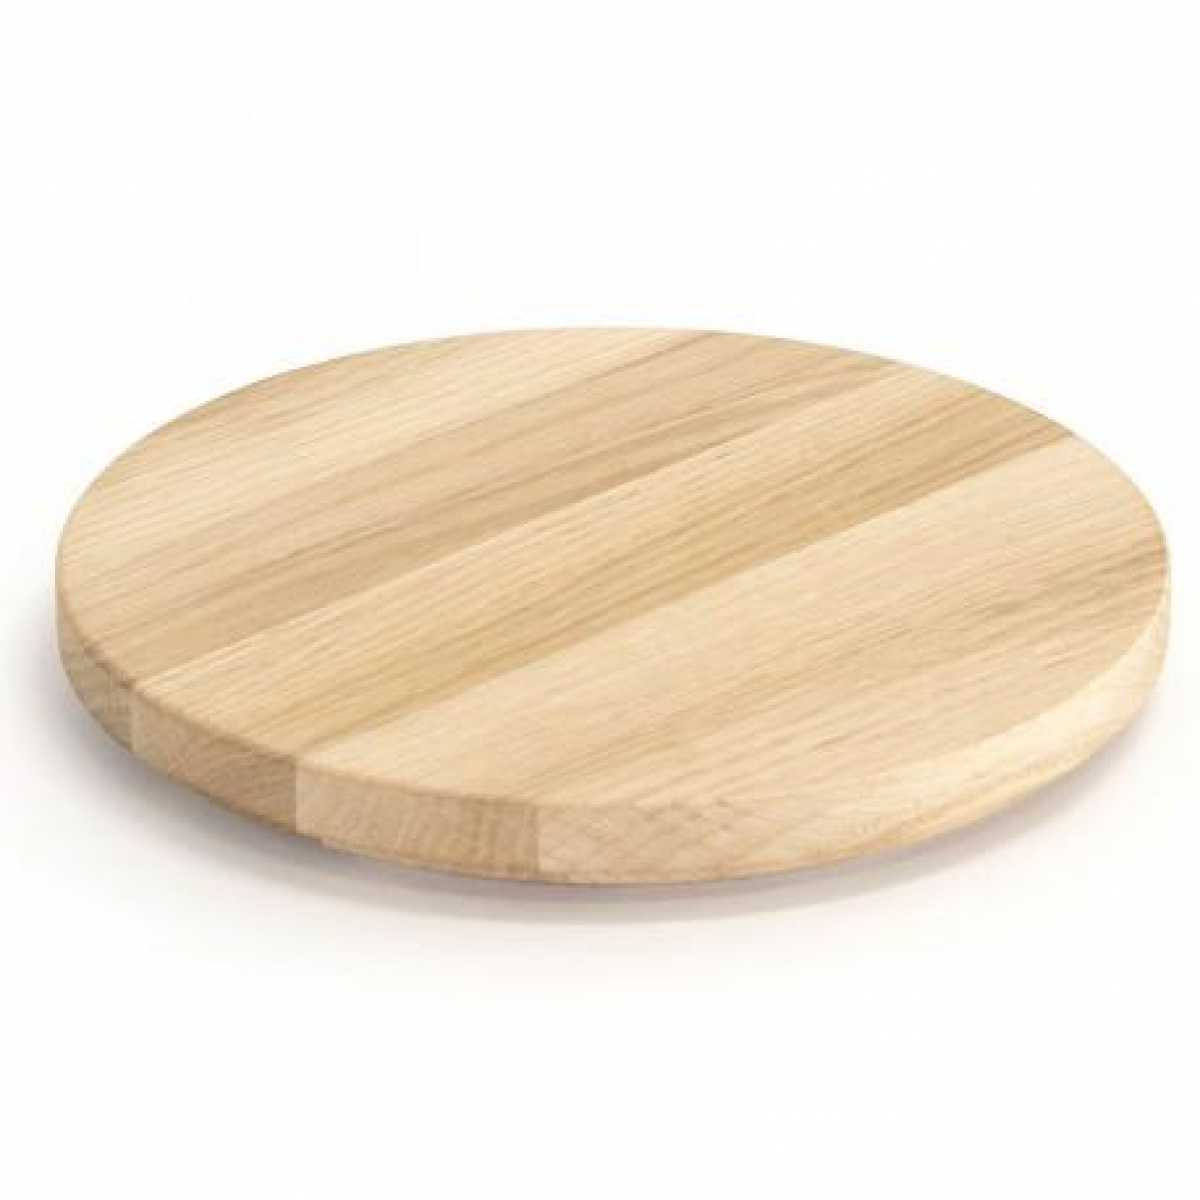 CRASTER Tilt Oak Round Plinth - Meşe